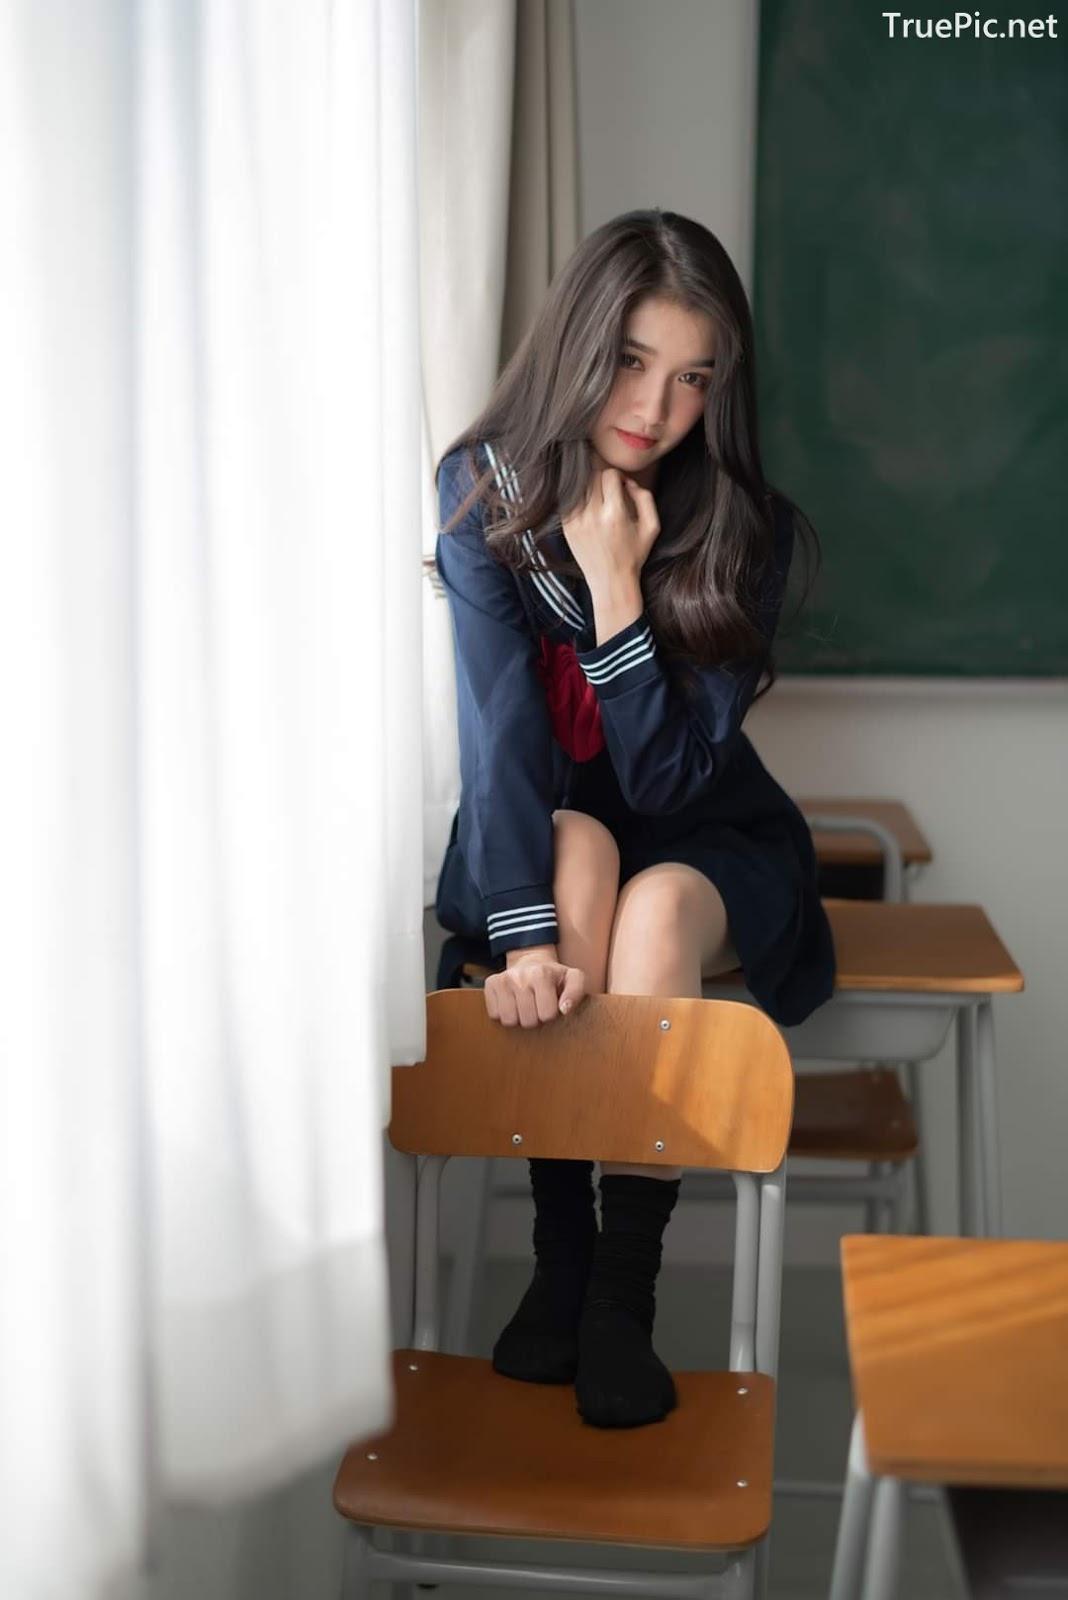 Image Thailand Cute Model - Yatawee Limsiripothong - Missing School - TruePic.net - Picture-4